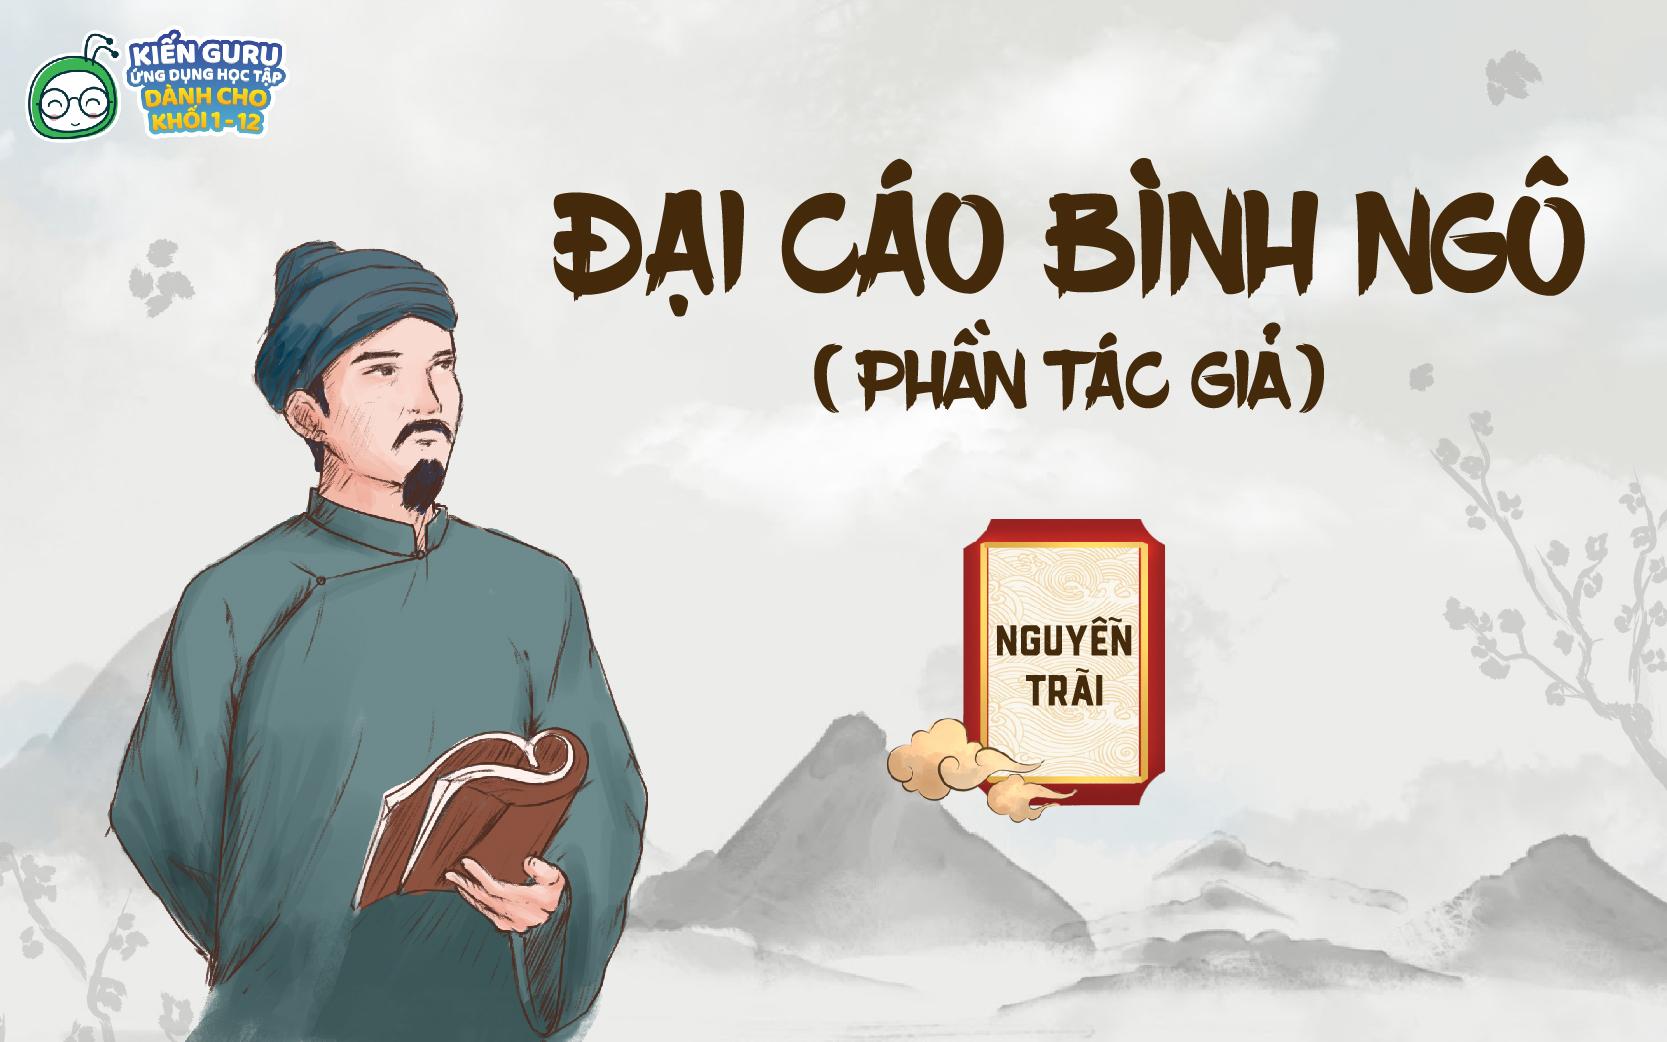 soan-bai-binh-ngo-dai-cao-phan-1